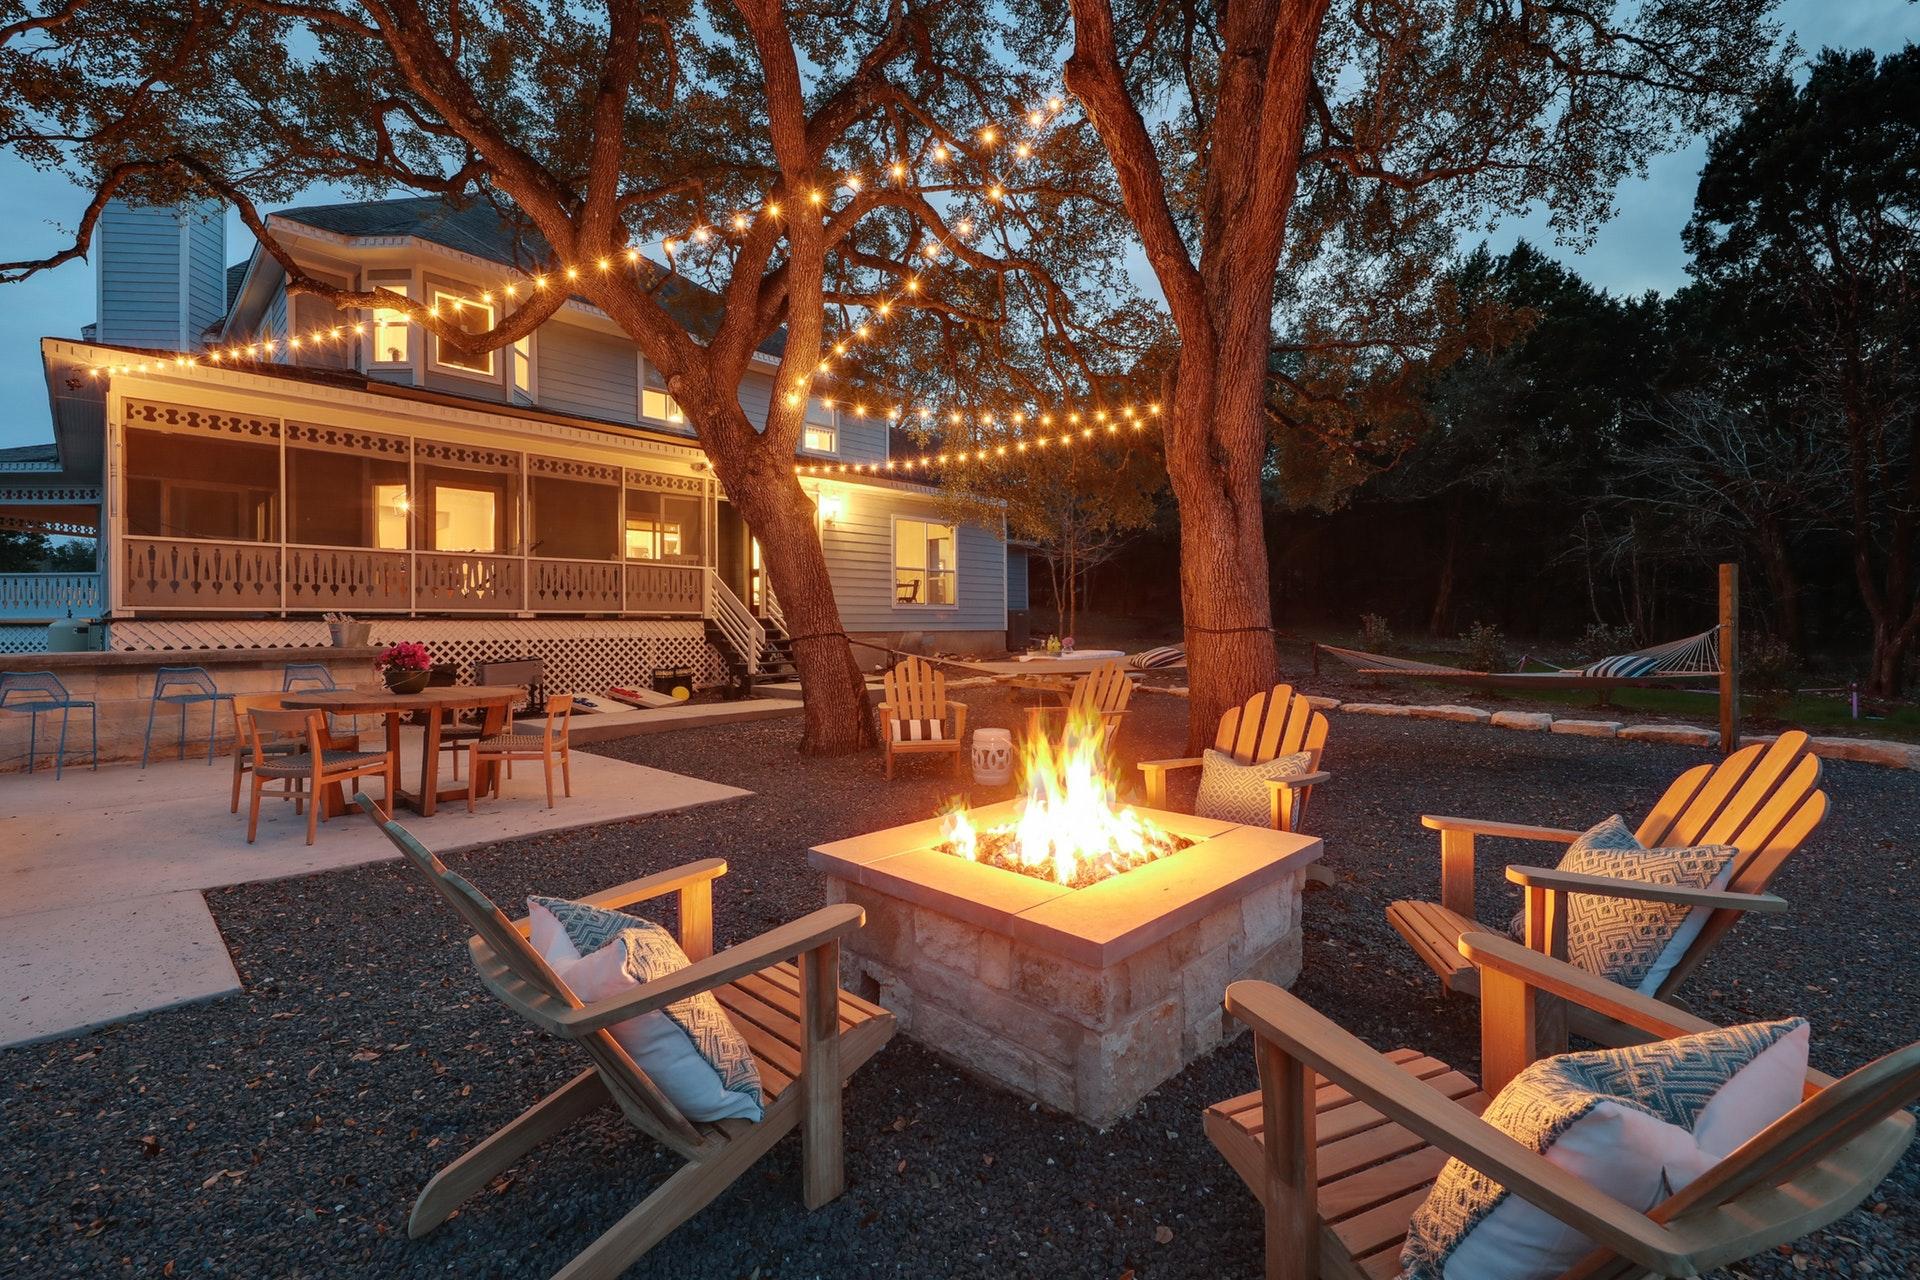 Modern Farmhouse BnB Outdoor - Firepit and Teak Adirondack Chairs.jpg